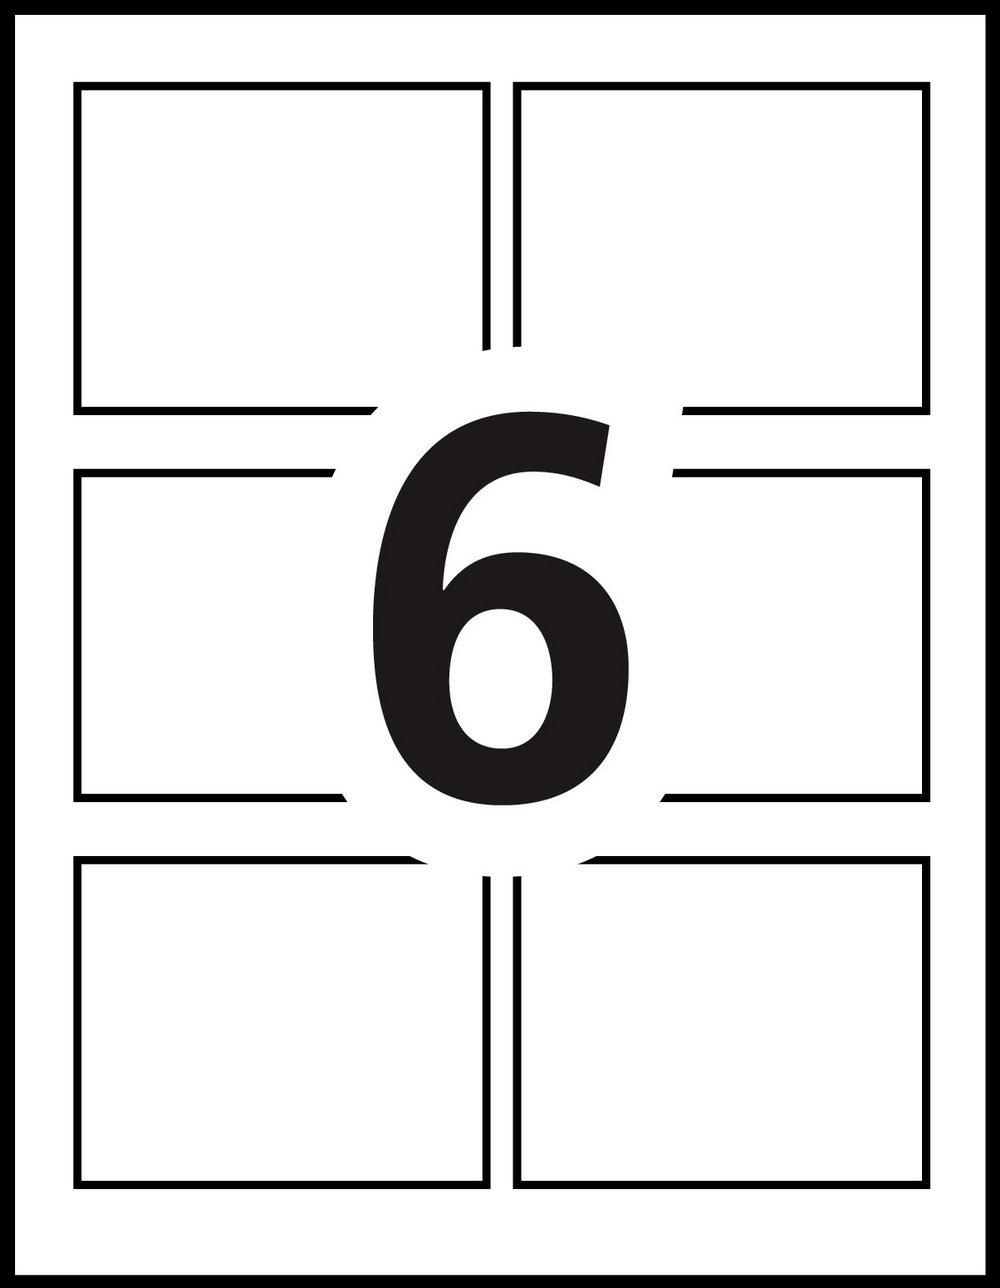 Avery Name Badge Template 5392